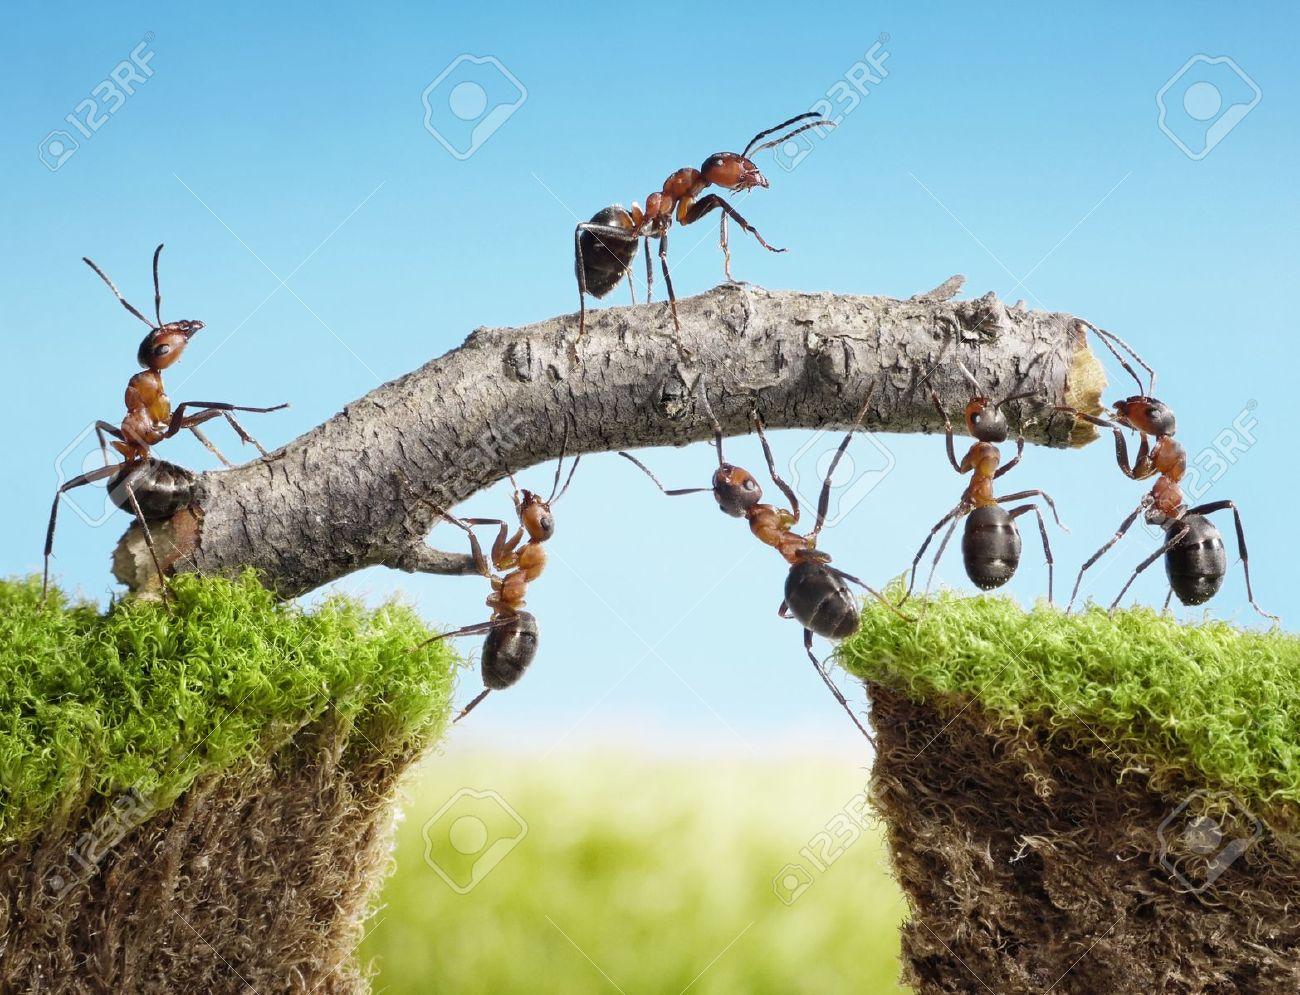 team of ants constructing bridge with log, teamwork - 10355173